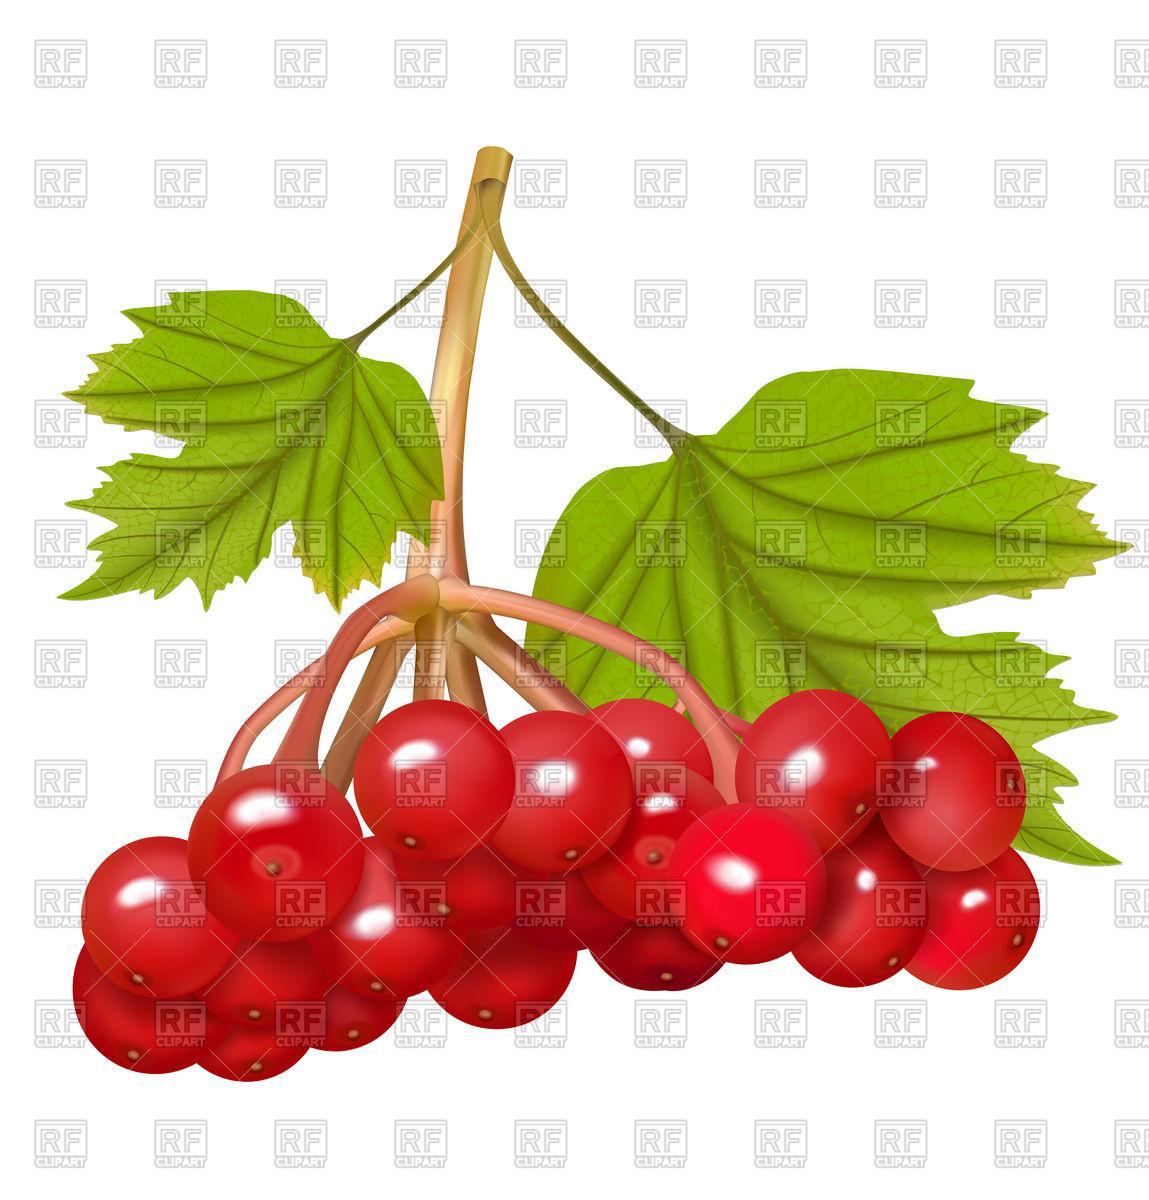 Red viburnum berries Vector Image #93852.